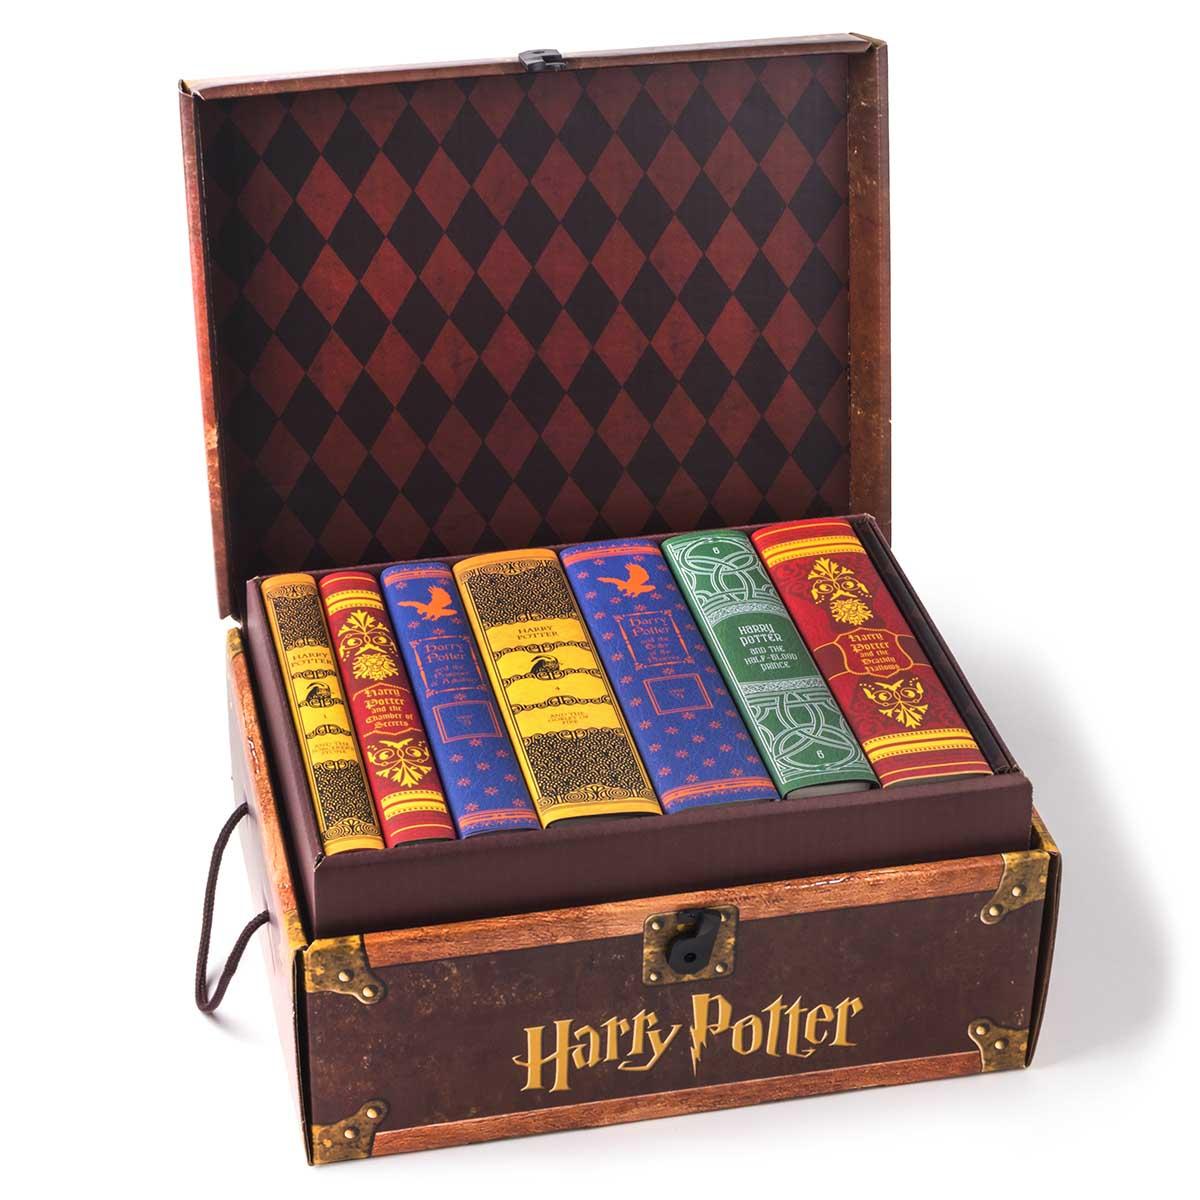 A box of the Harry Potter novels written by J.K. Rowling.